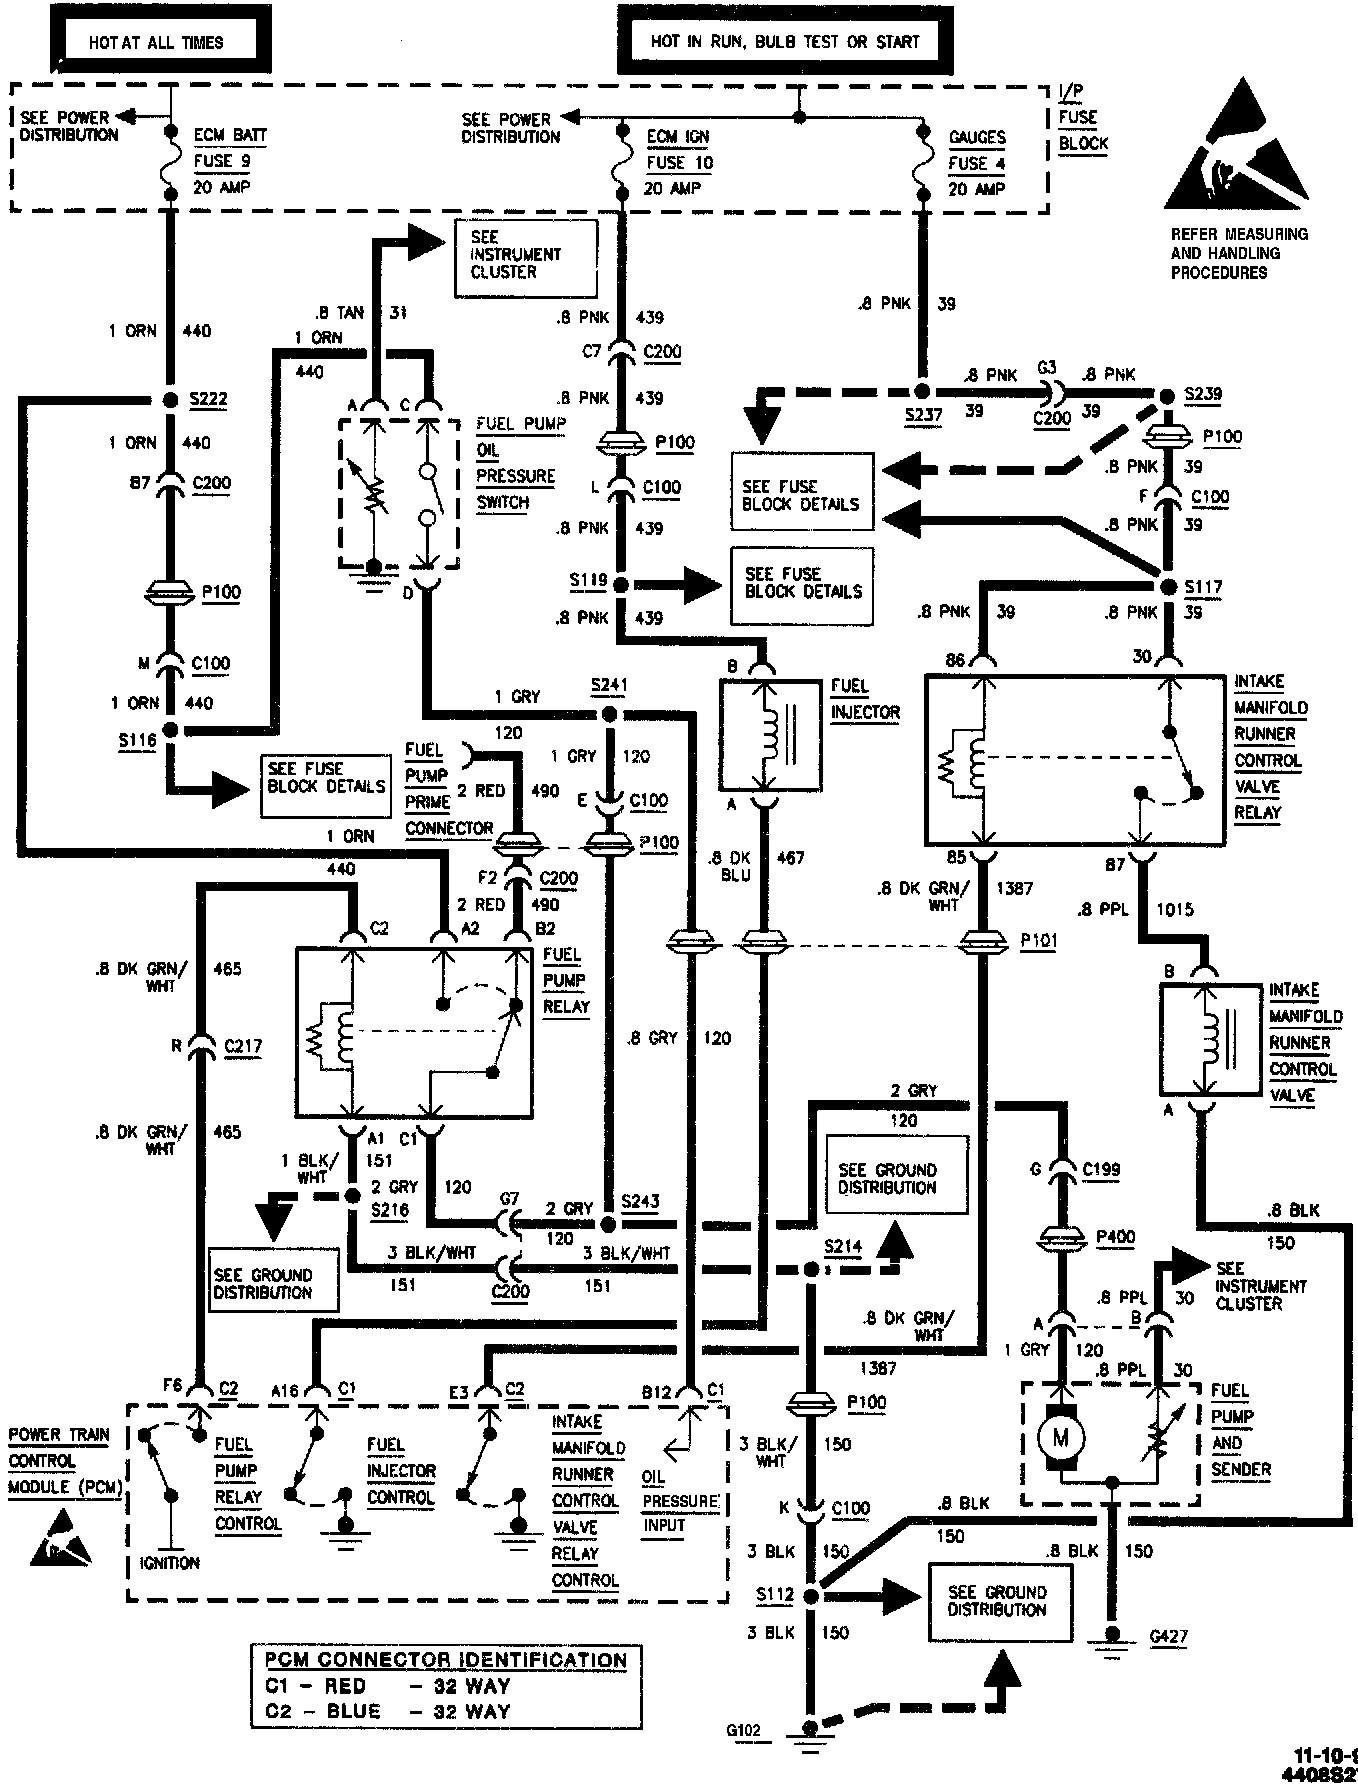 1981 honda cx500 deluxe wiring diagram